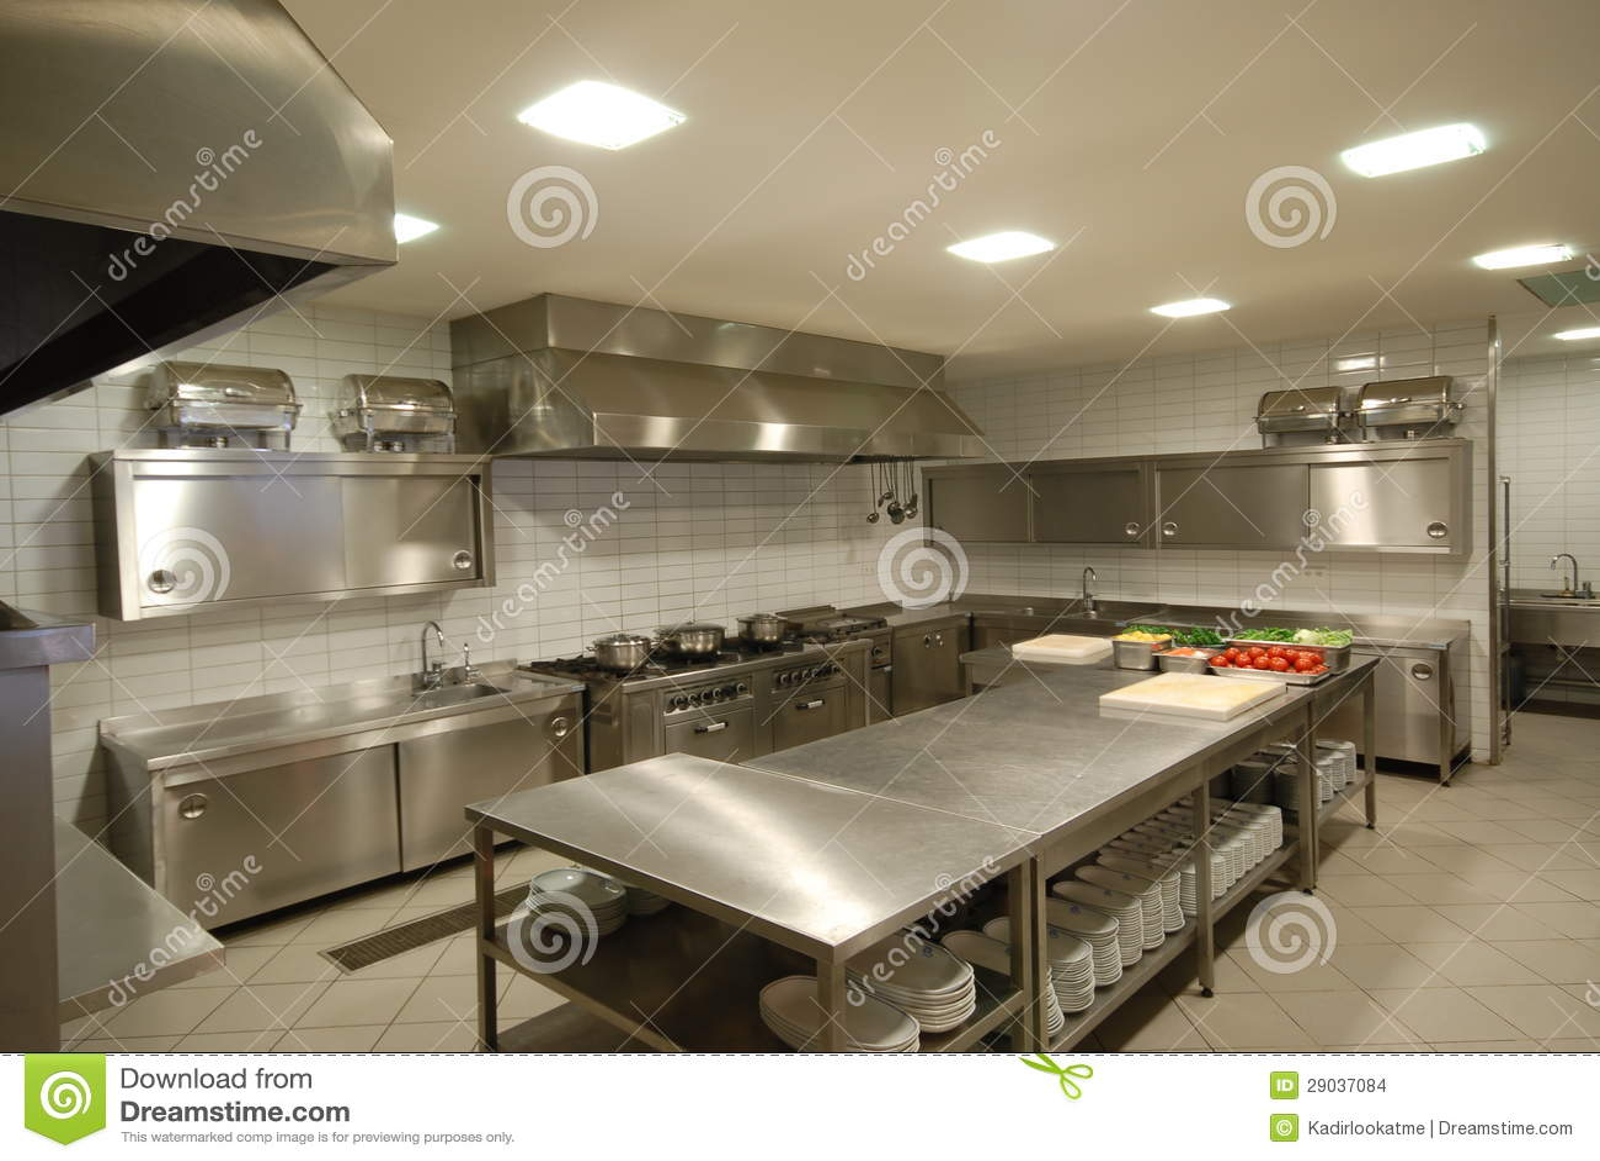 Cuisine Moderne Dans Le Restaurant Images Stock Image